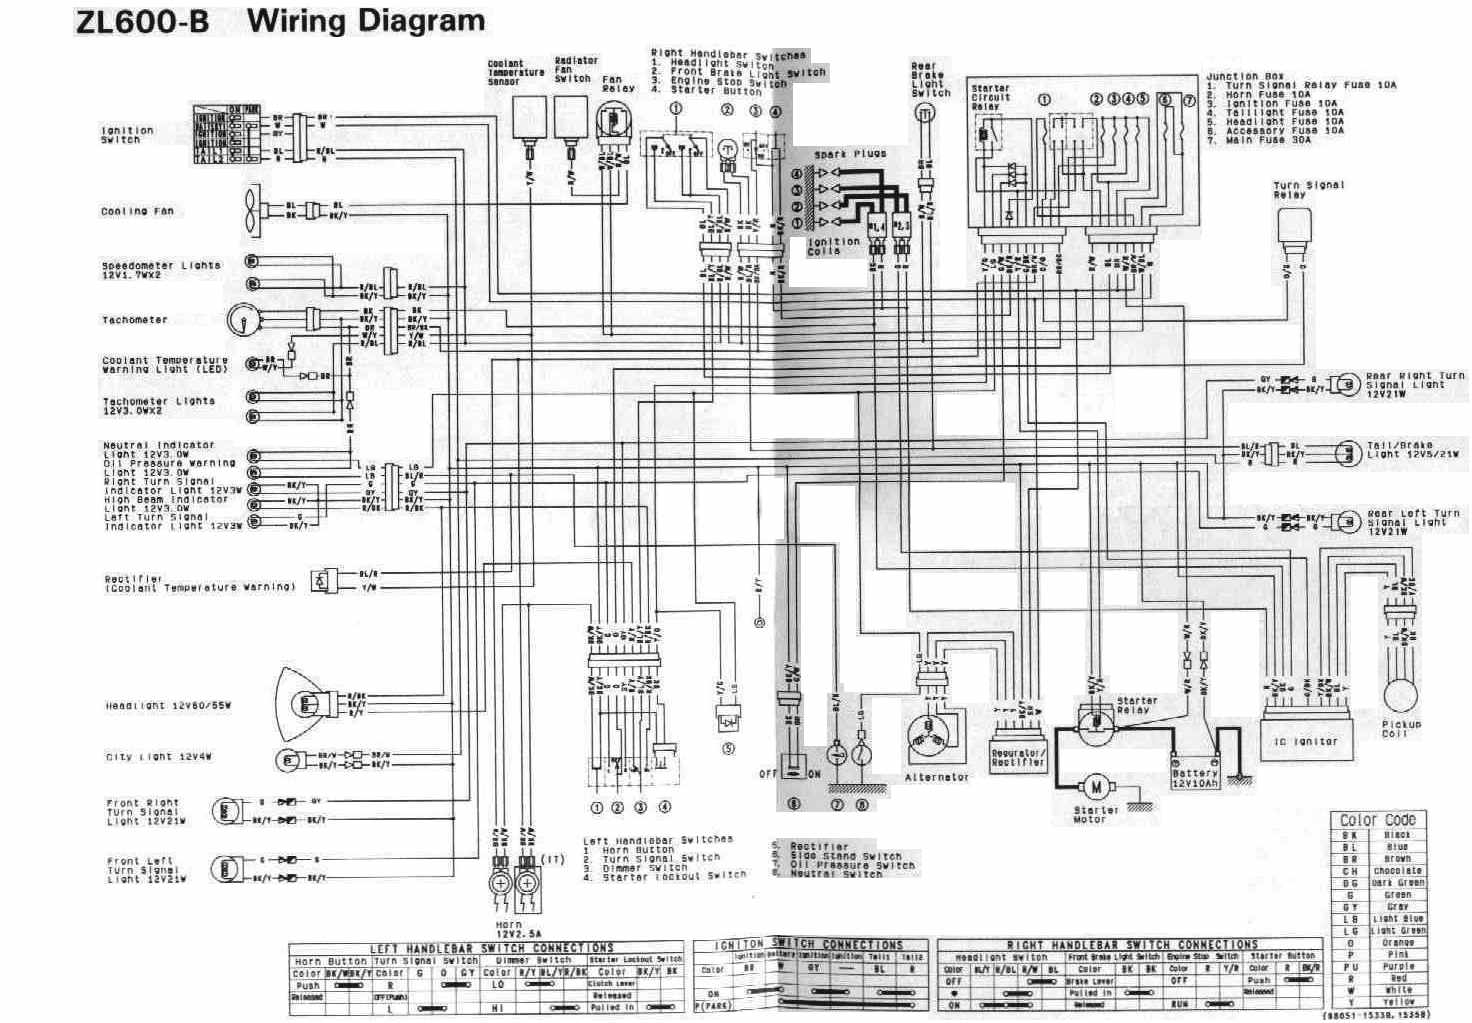 Kawasaki Wiring Diagram Wire Data Schema Fd750 Regulator Zx Cdi Schematics Diagrams U2022 Rh Seniorlivinguniversity Co Barako 175 Fb460v